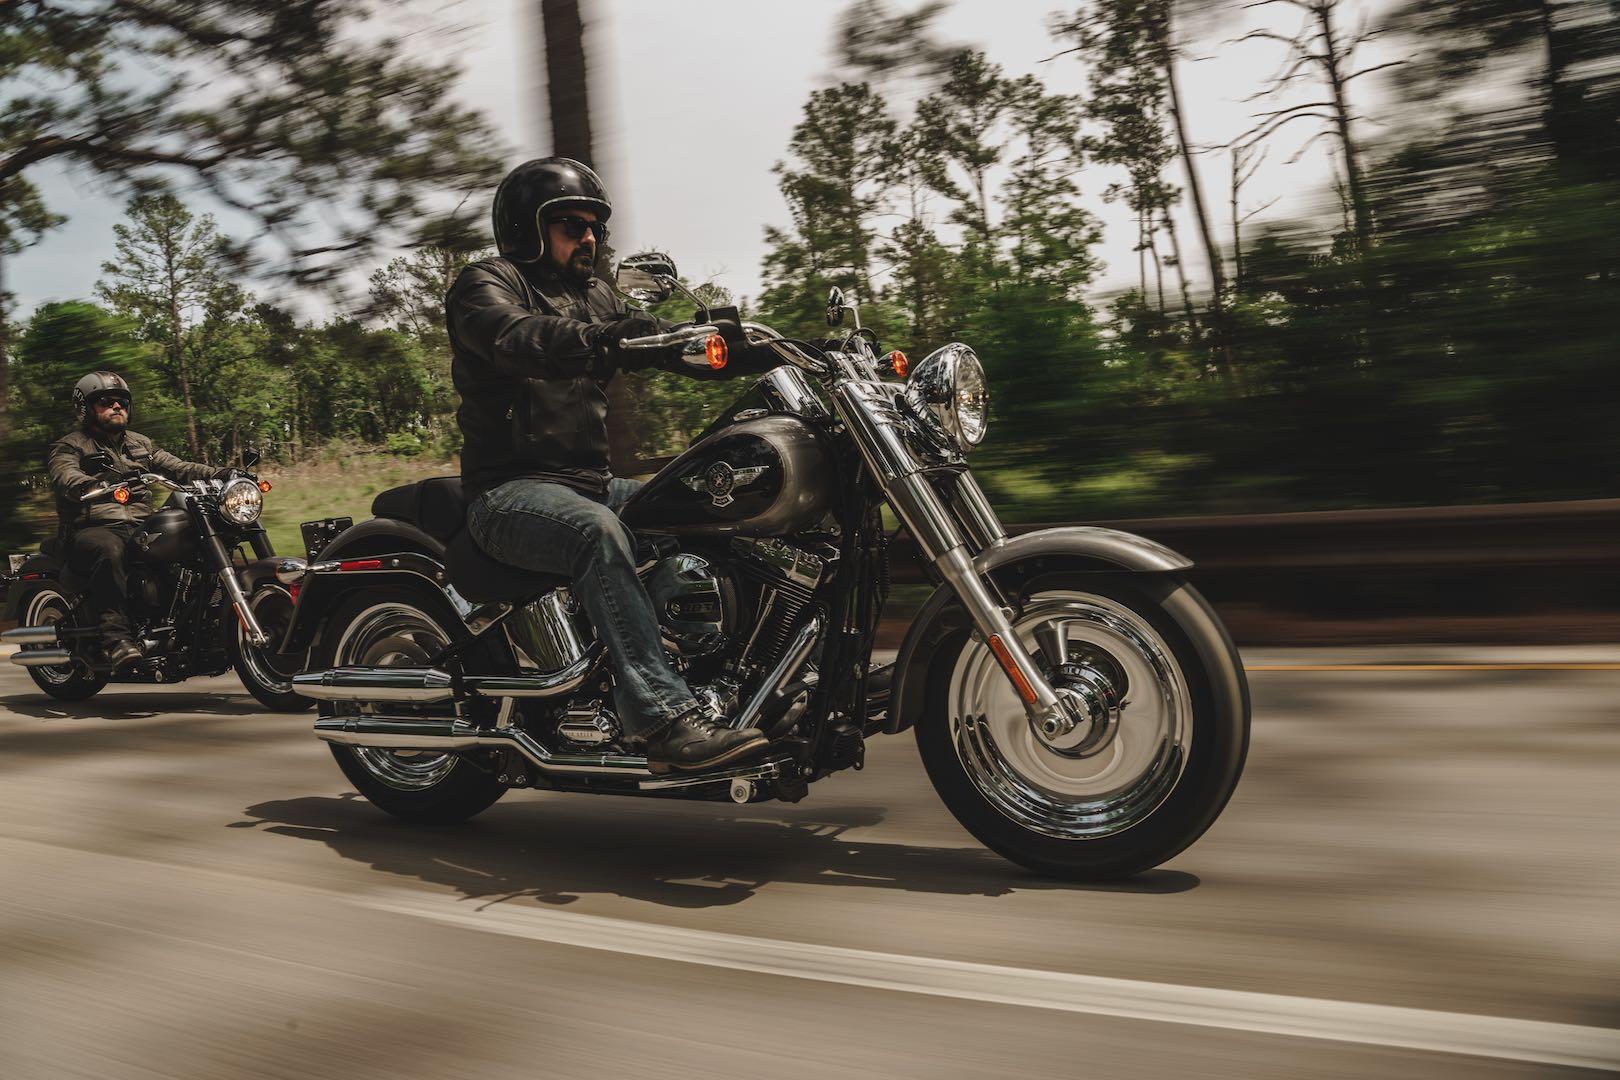 2017 Harley-Davidson Softail Fat Boy specs